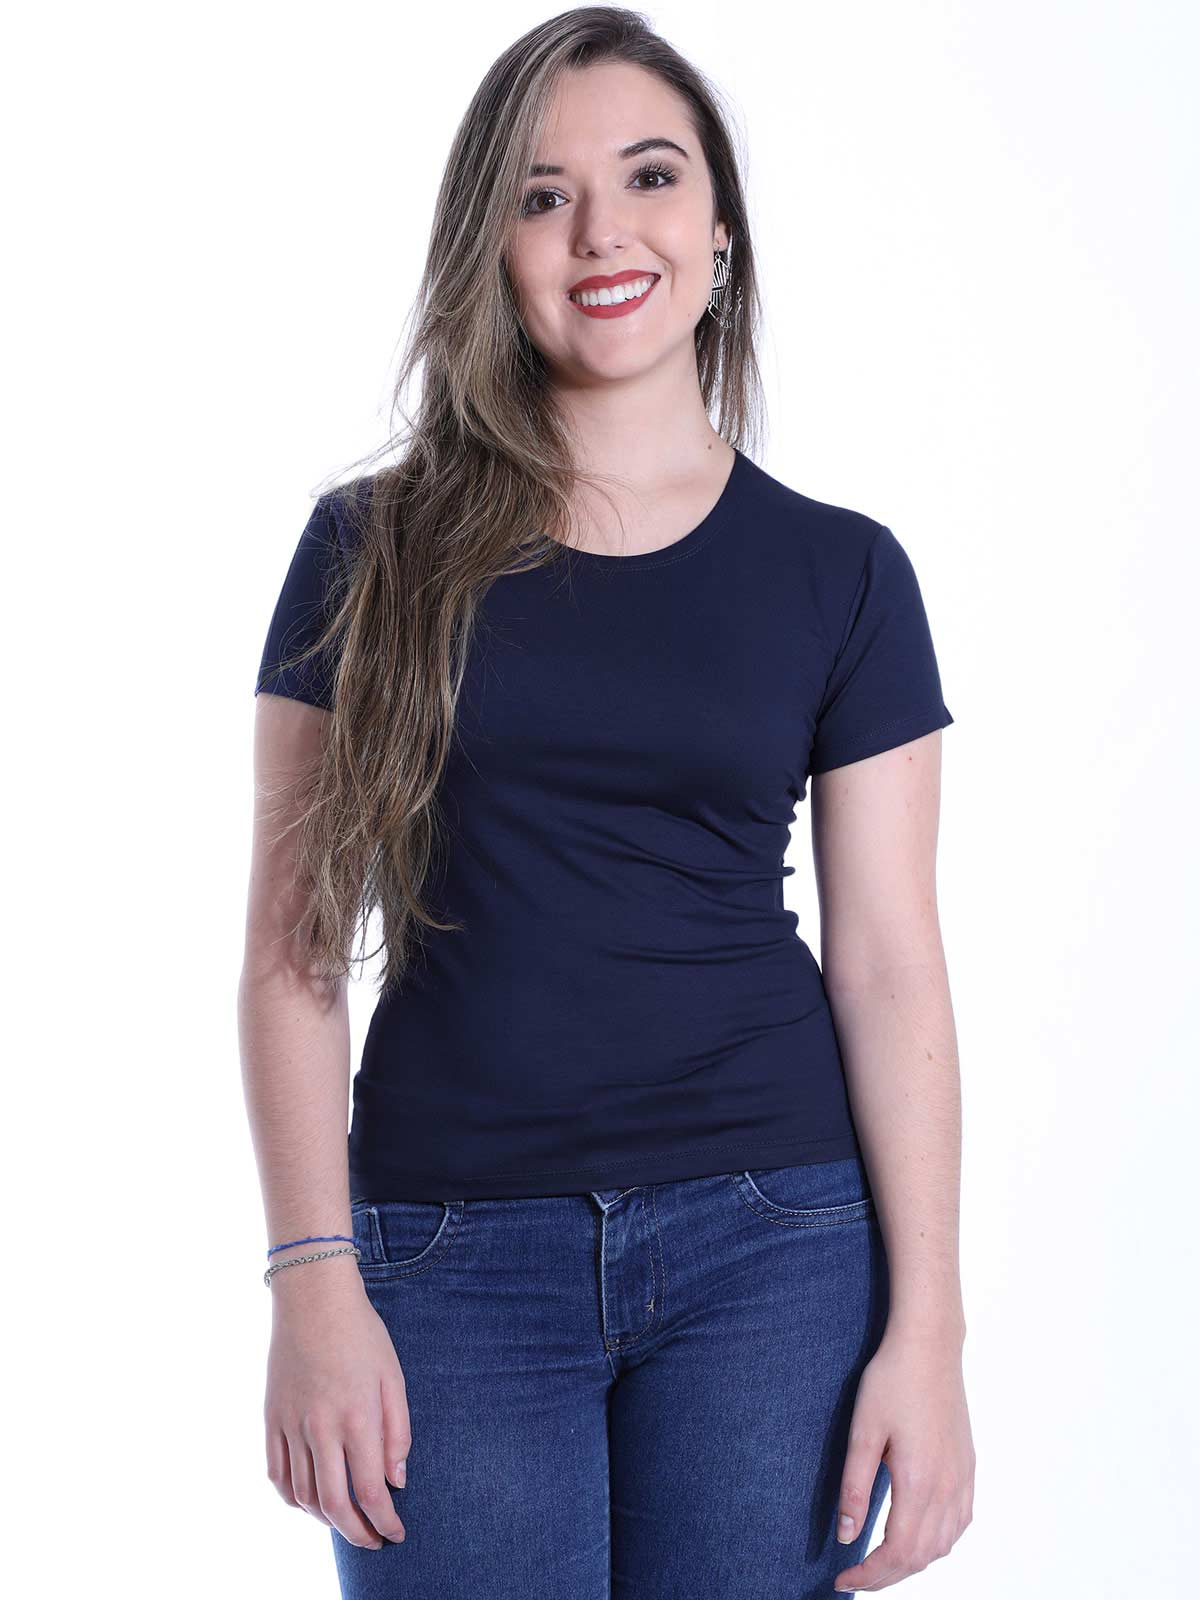 Baby Look Anistia de Viscolycra Básica Azul Marinho